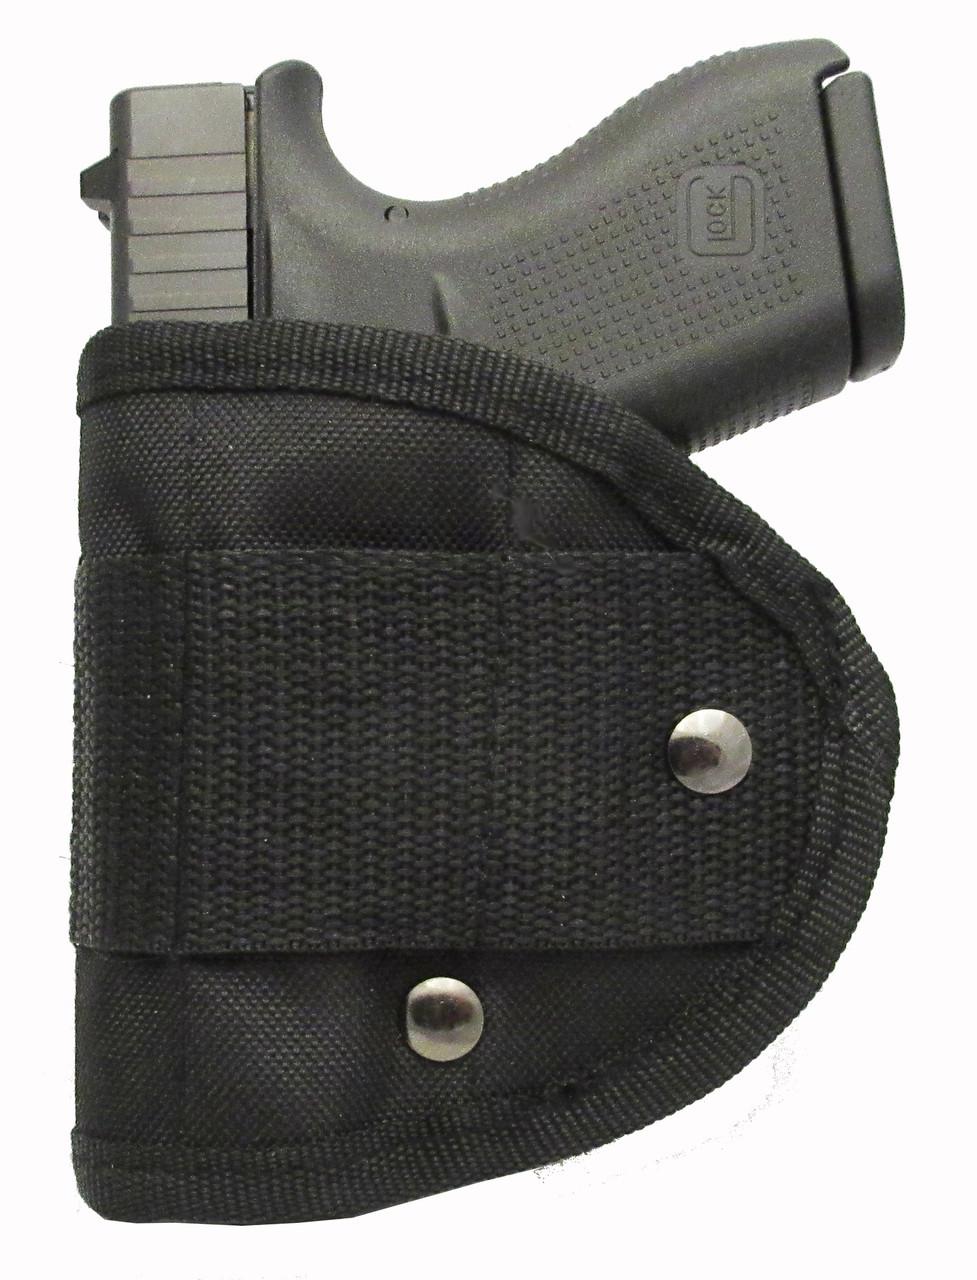 Inside Waistband Poly Sling Holster Fits Glock 42 380 IWB (M1)